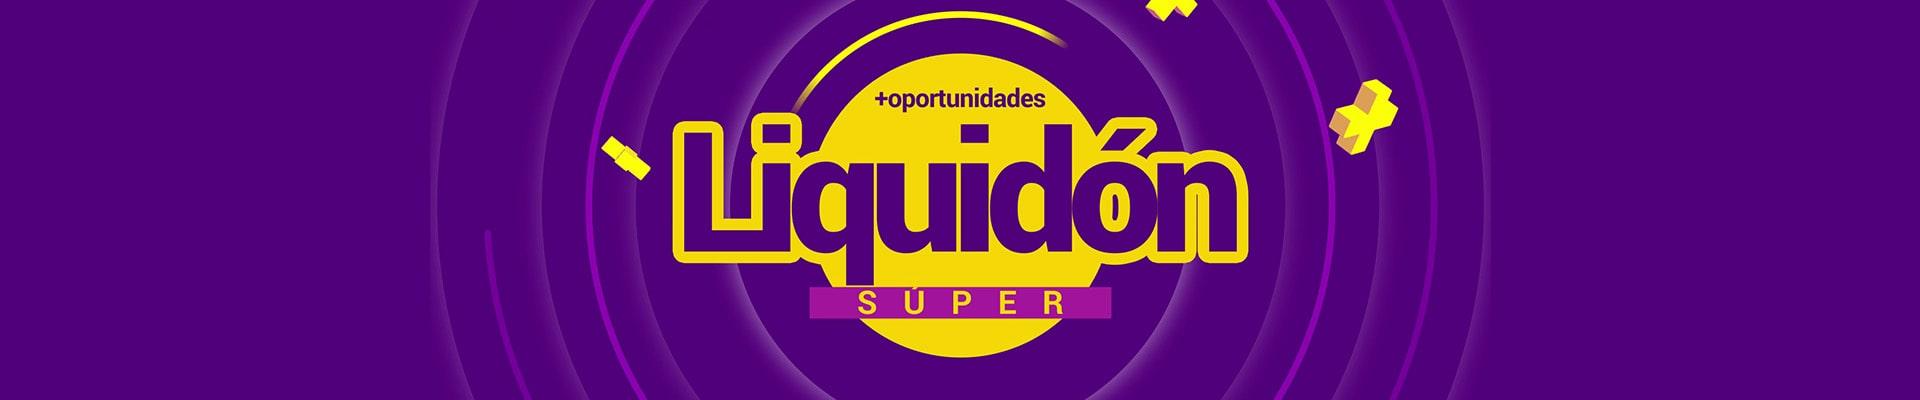 super liquidon